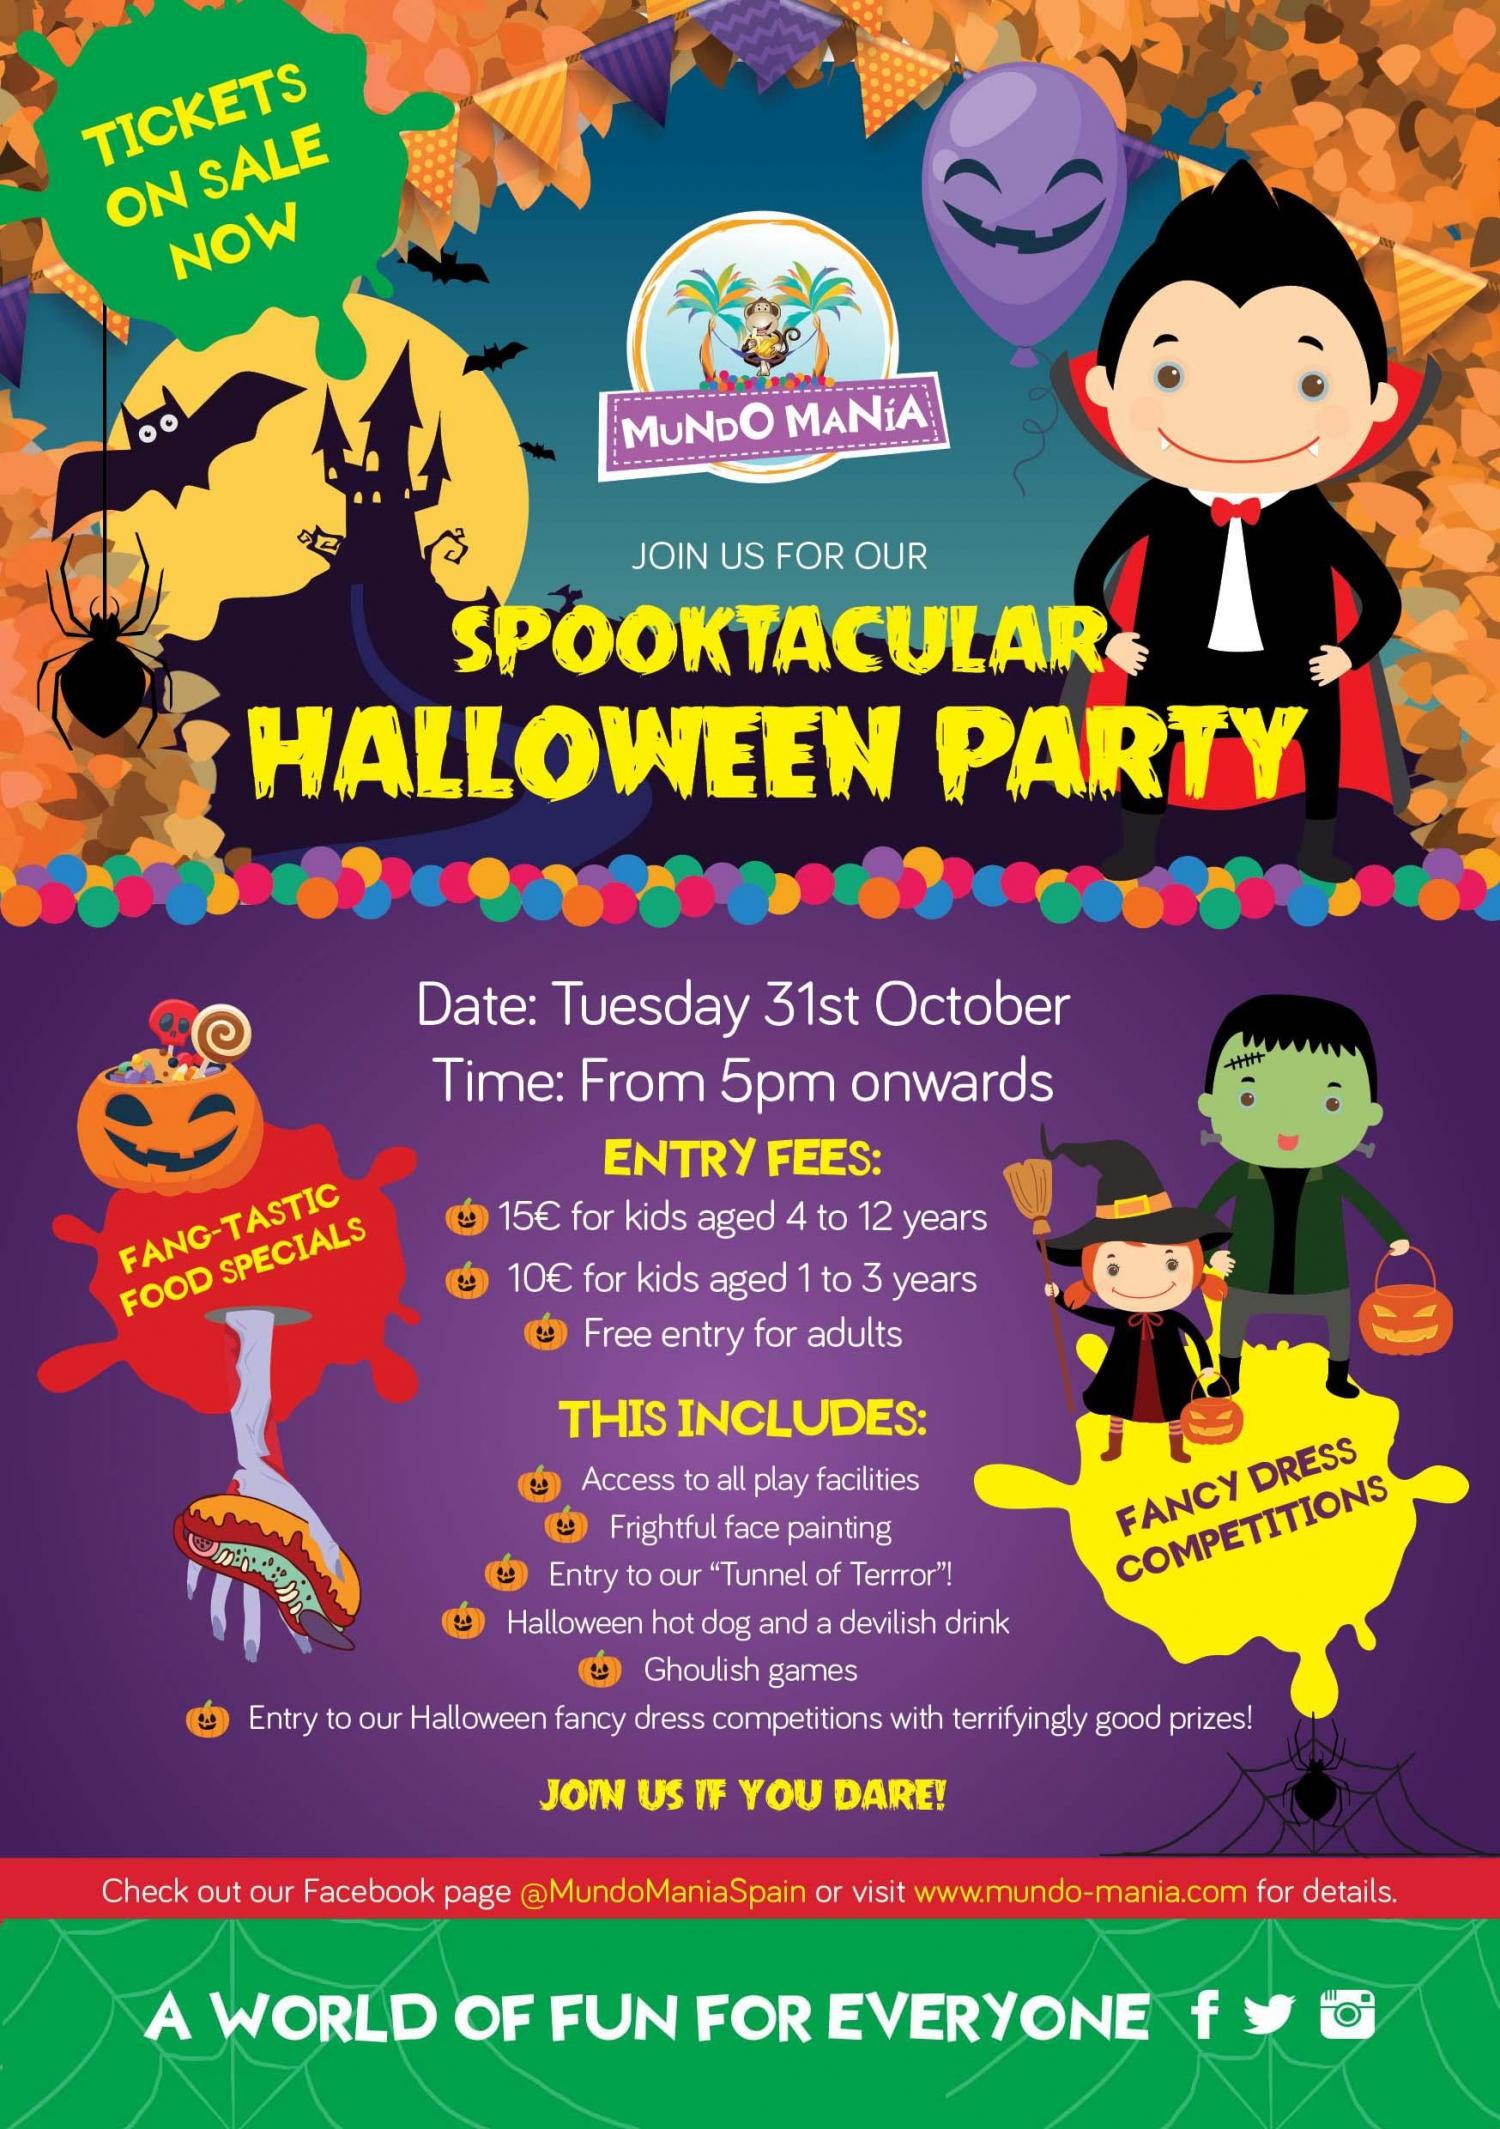 Halloween Party at Mundo Mania